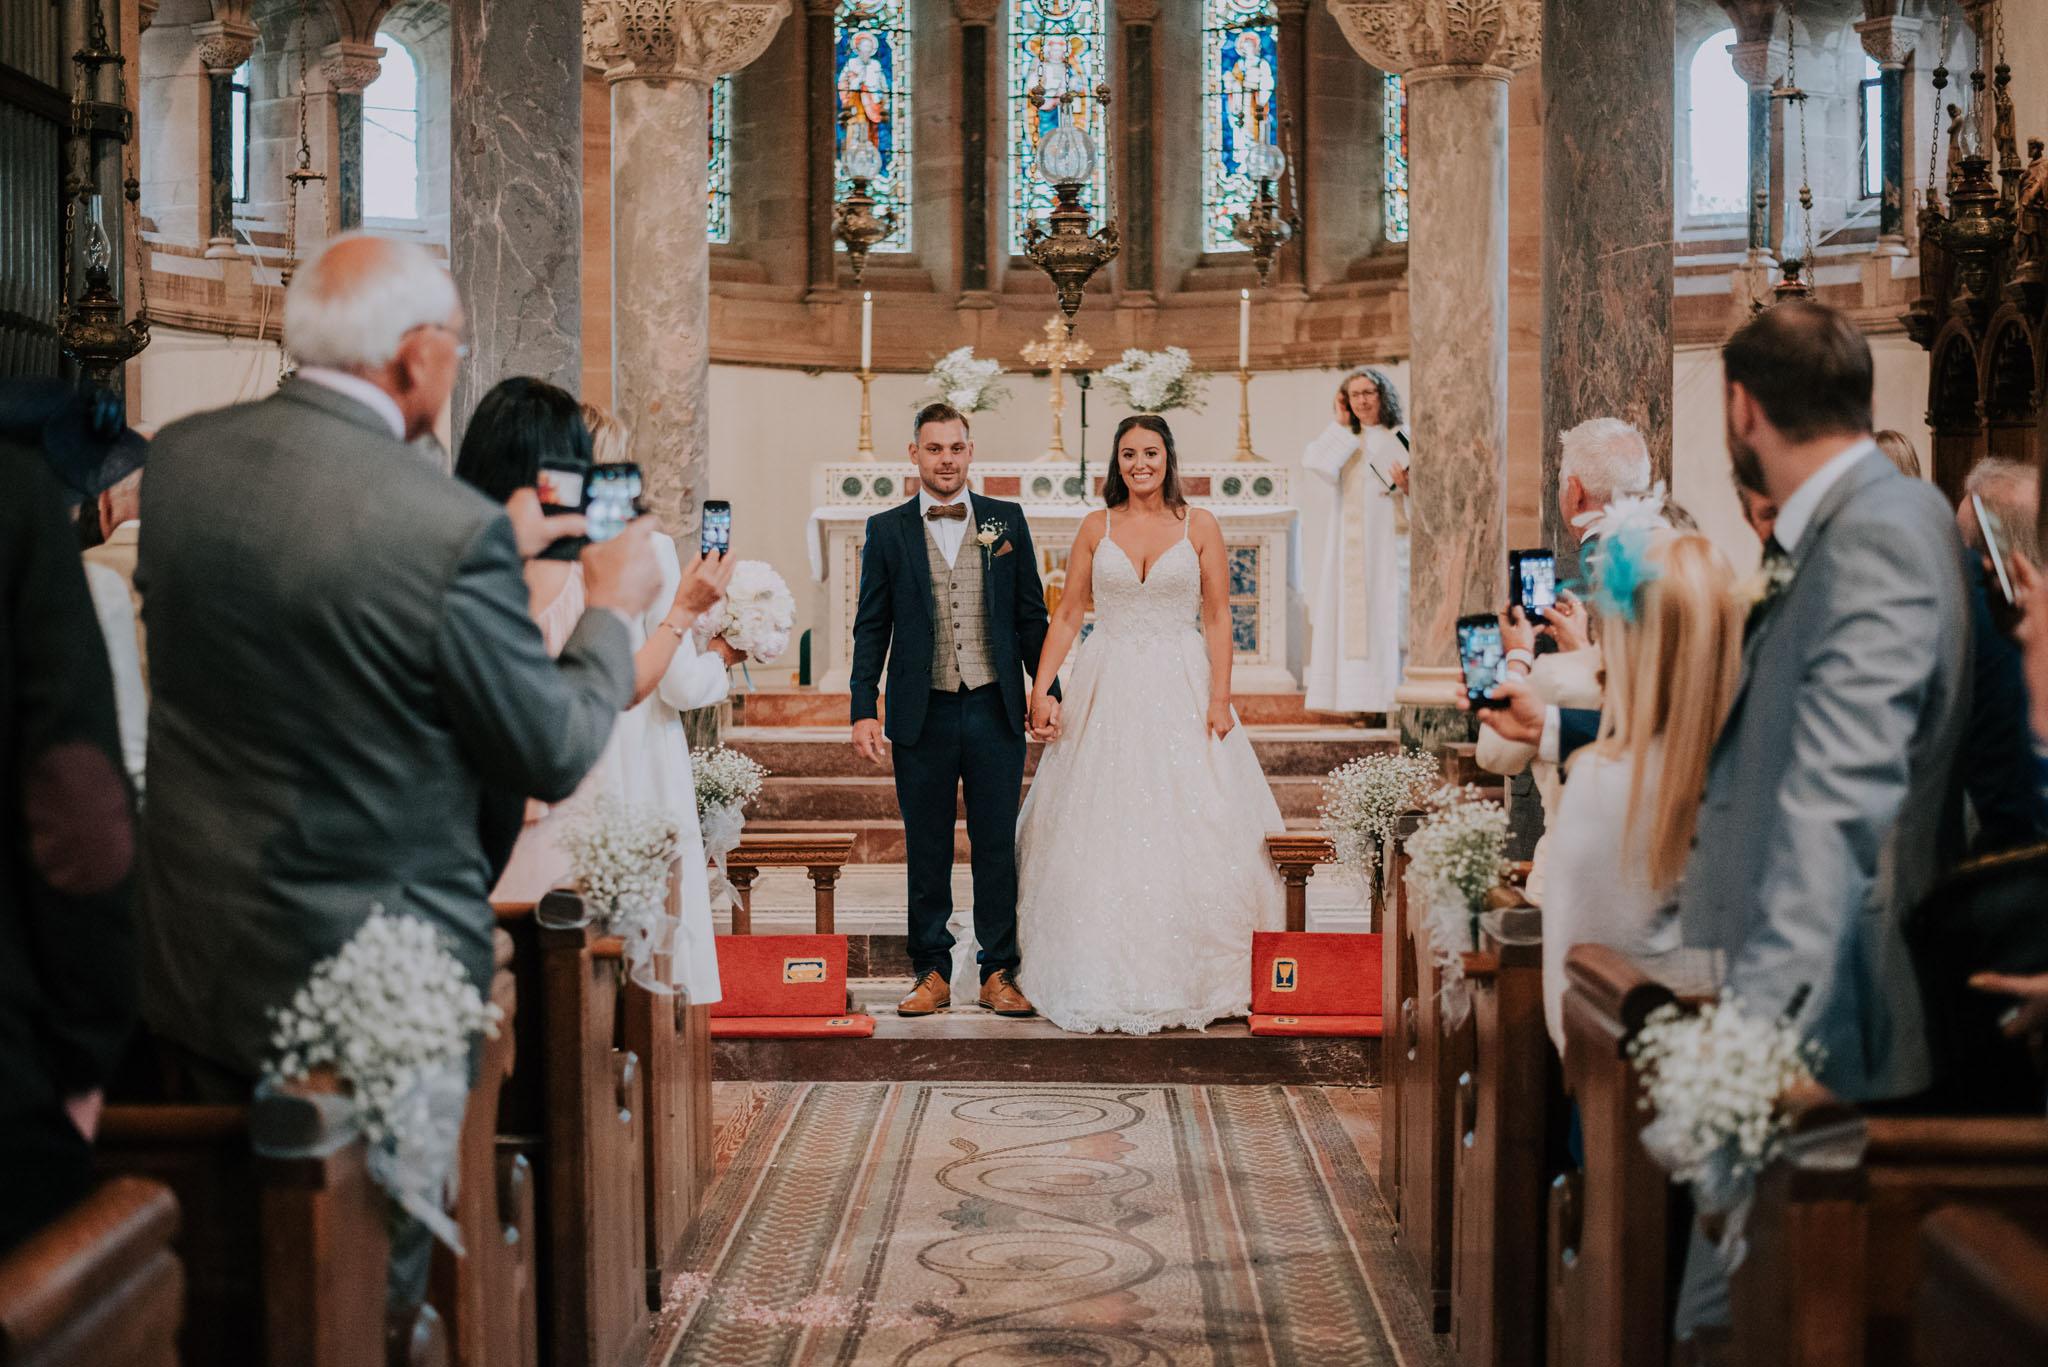 wedding-photographer-glewstone-court-hereford-scott-stockwell-photography222.jpg